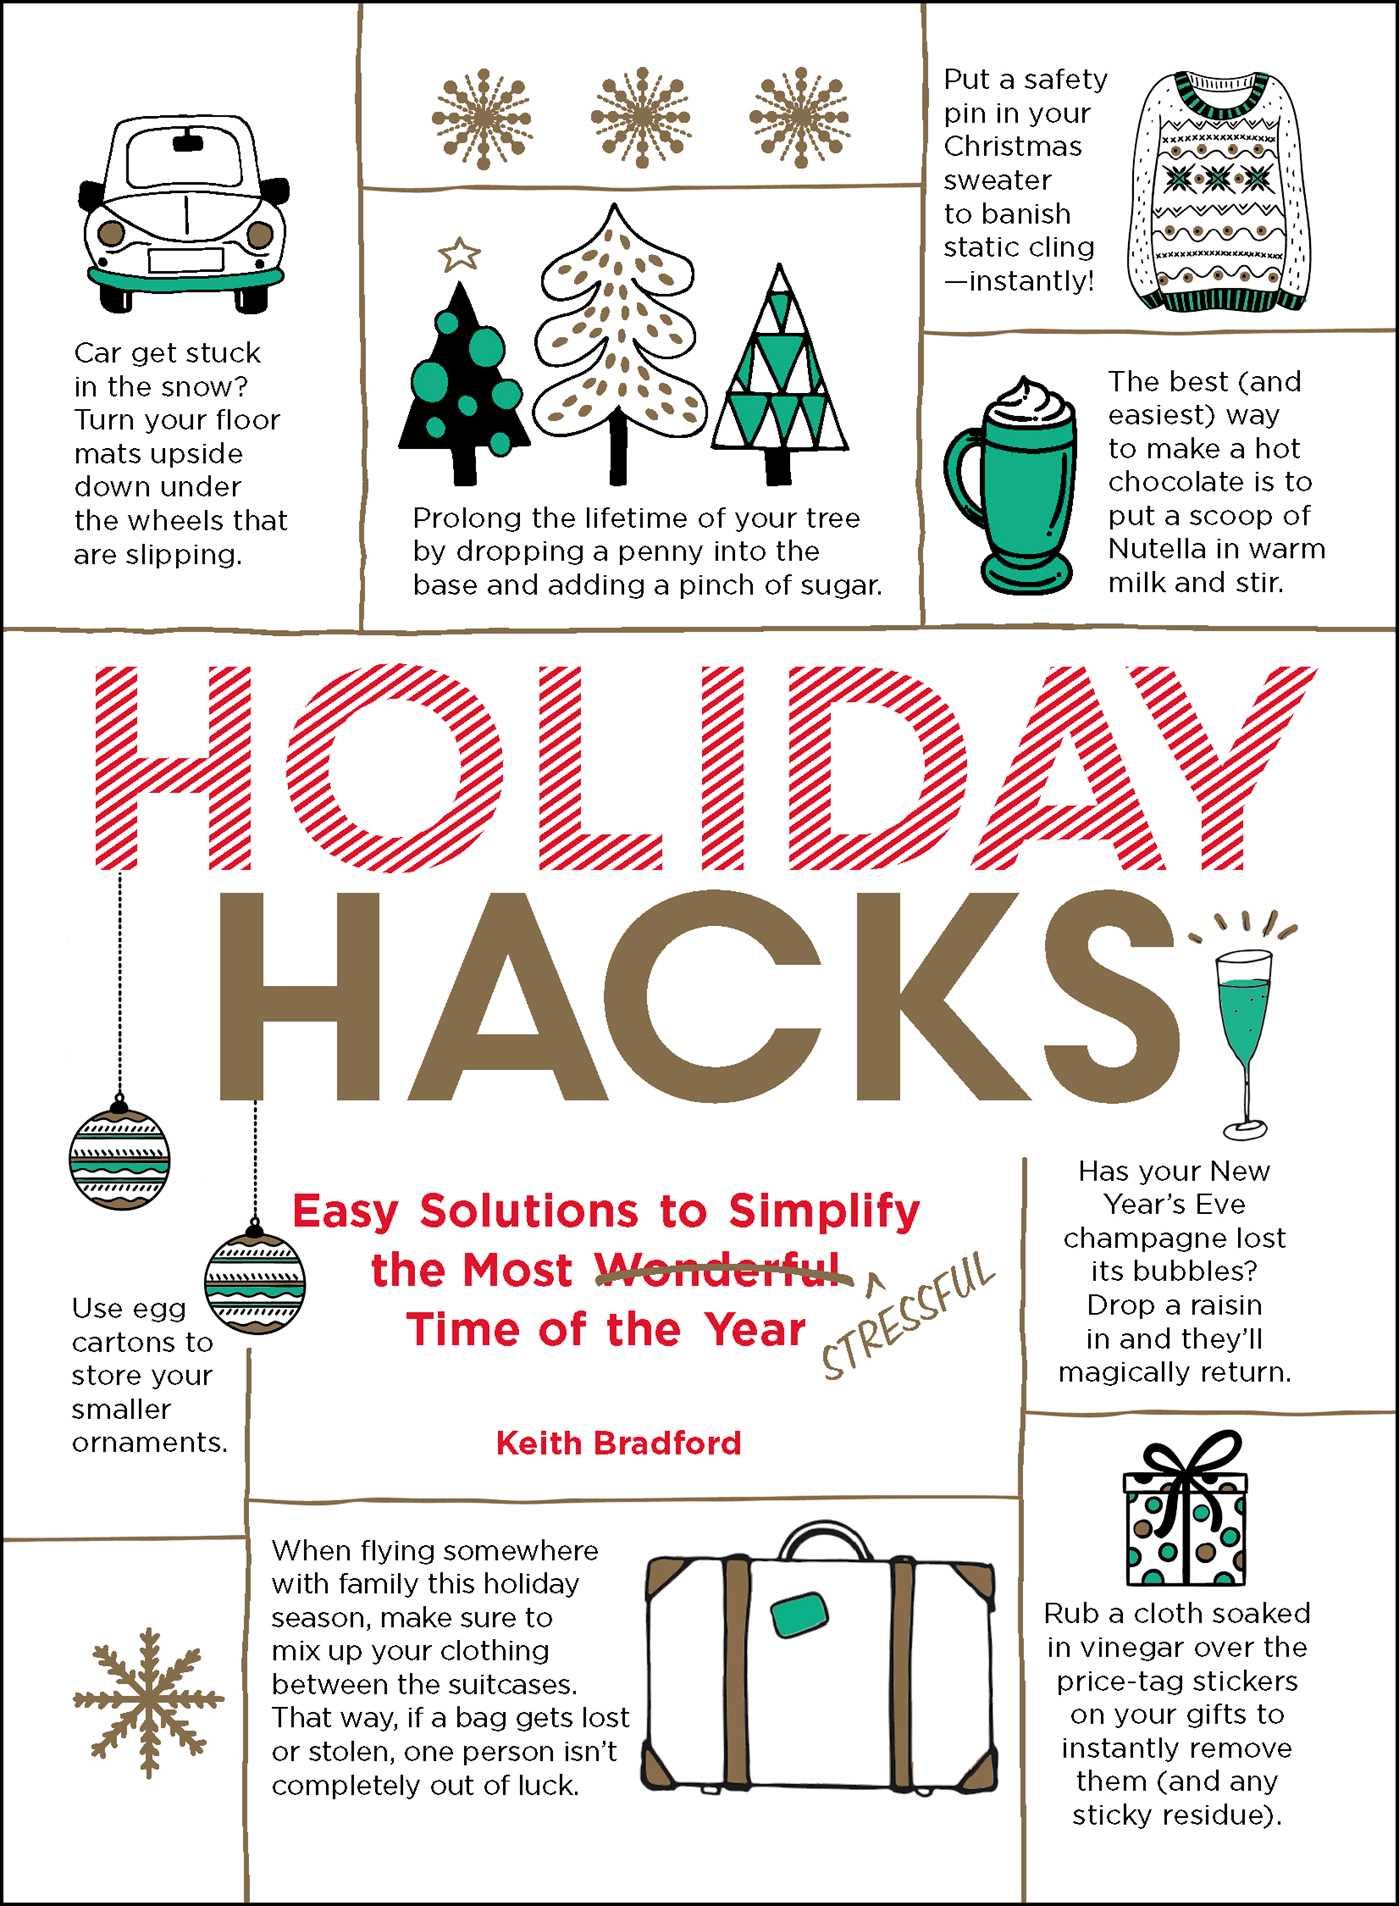 Holiday hacks 9781507208588 hr